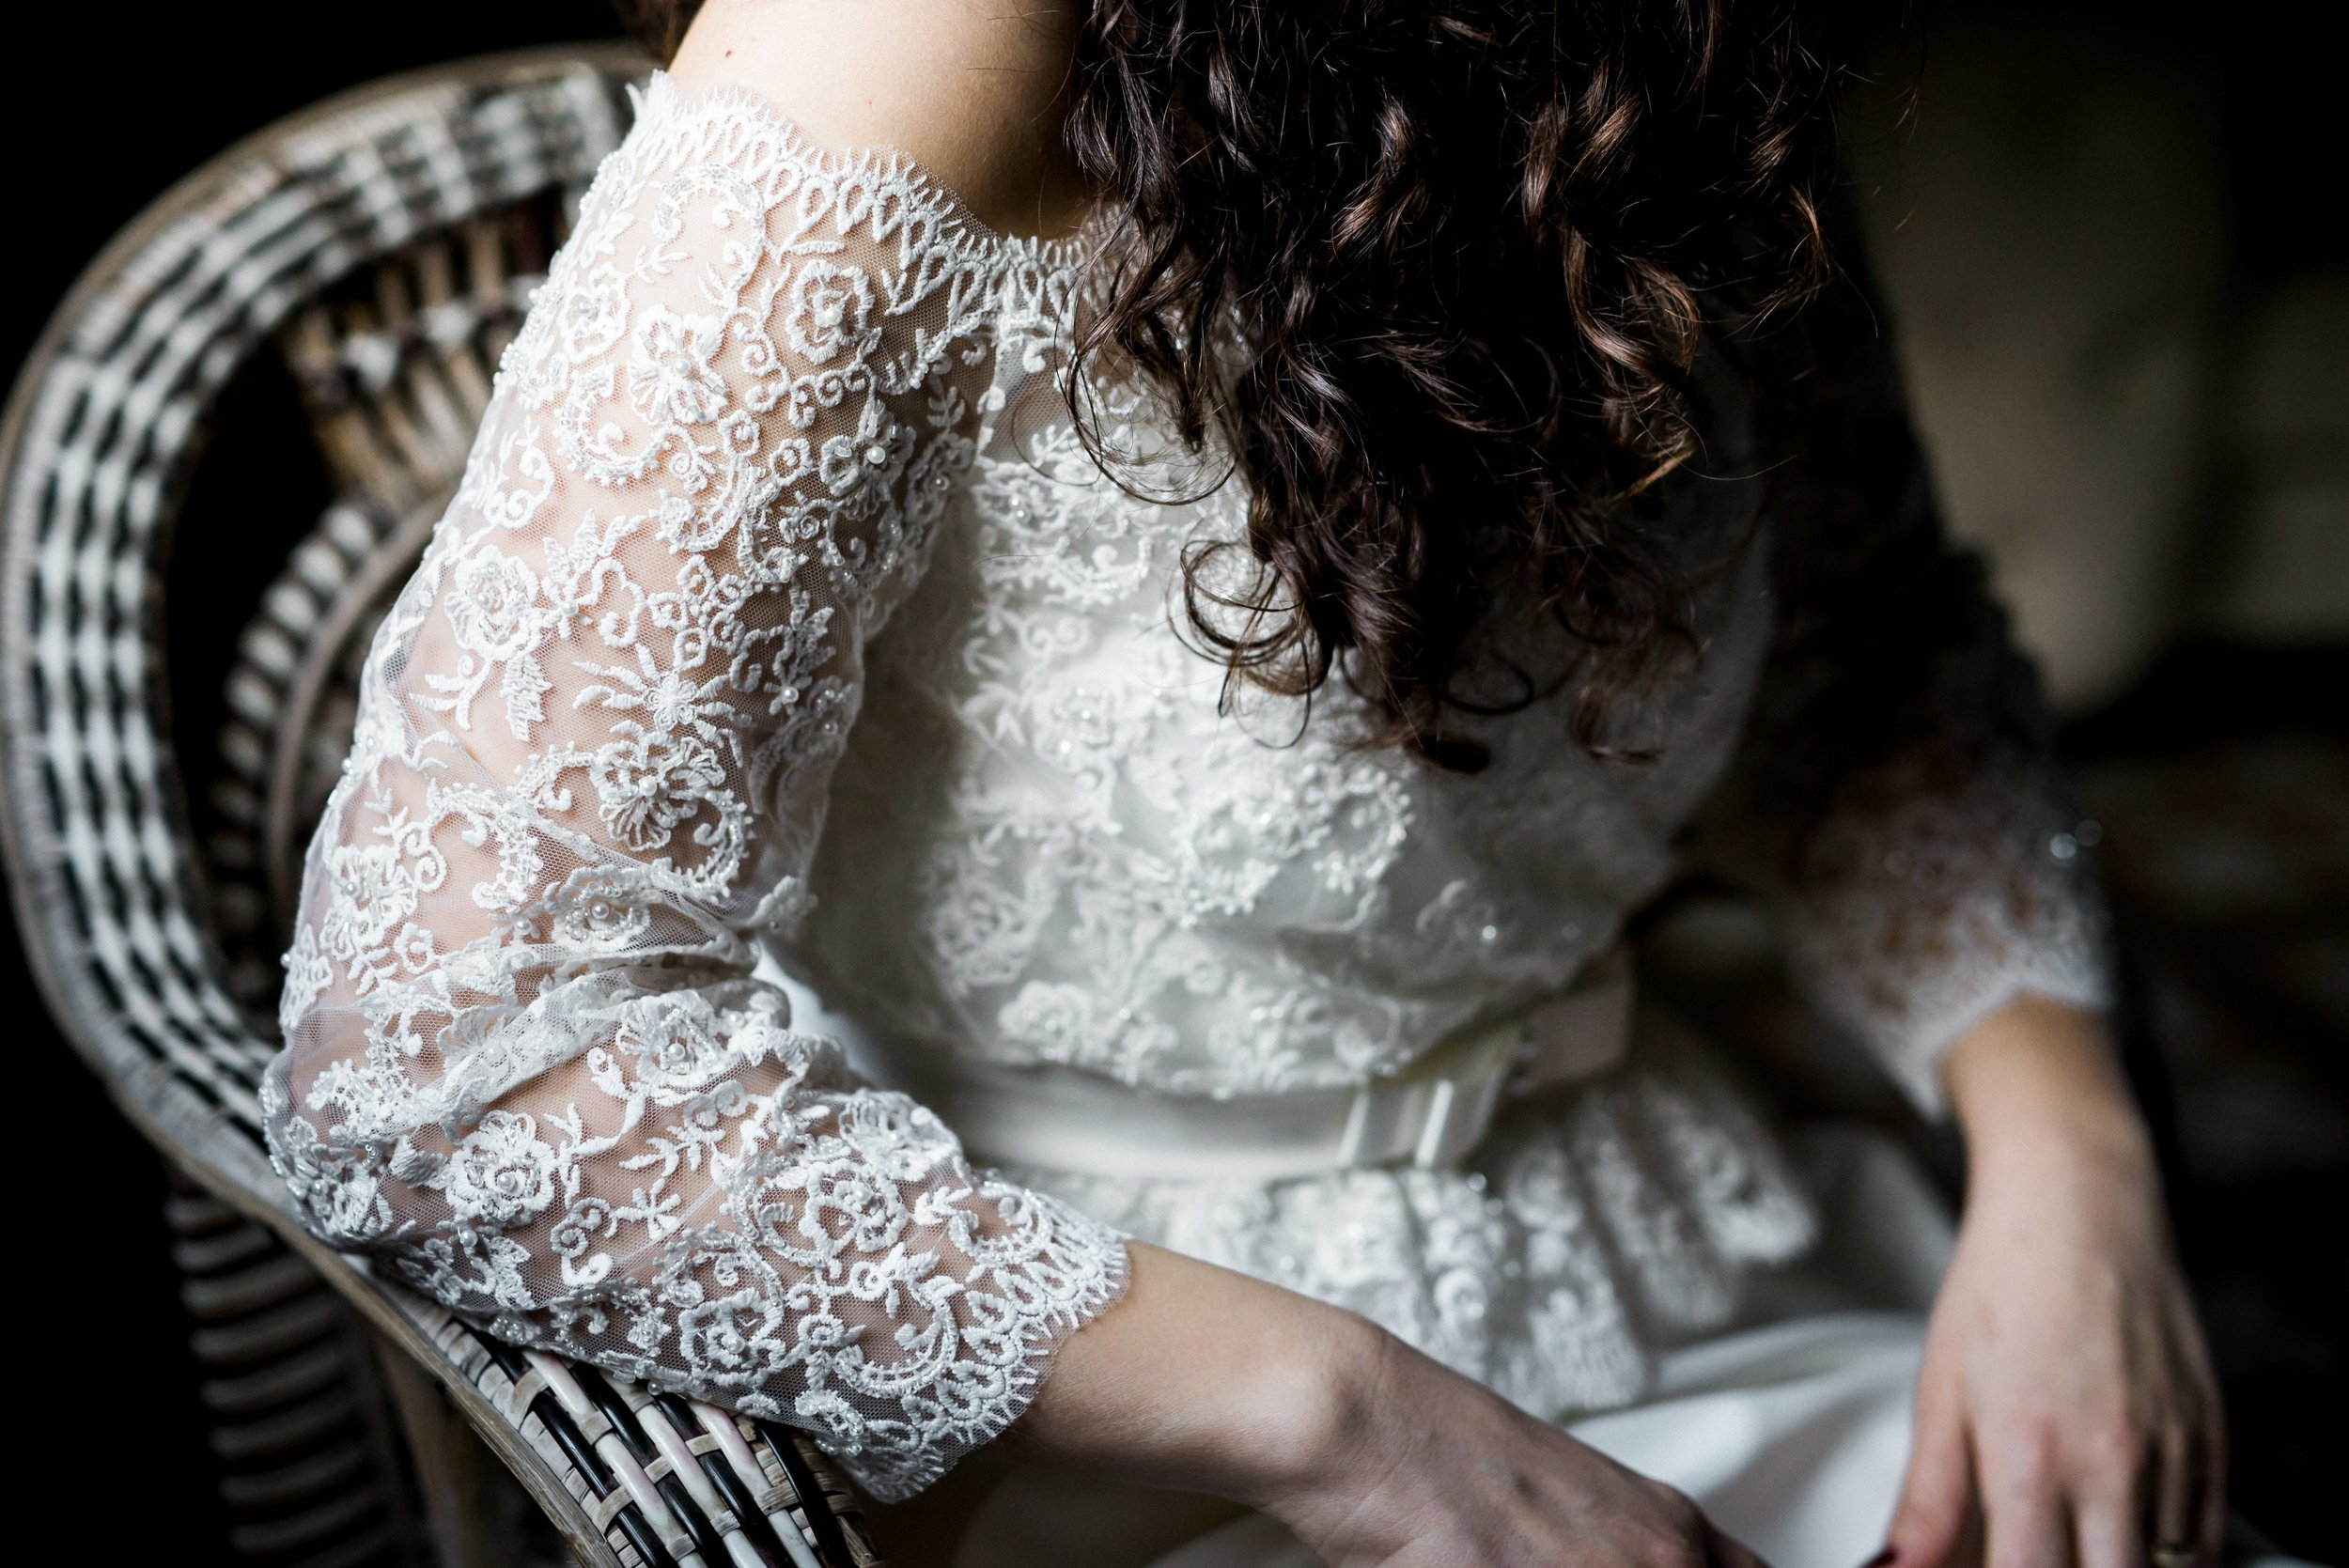 israel-garden-wedding-portraits-session-kate-giryes-photography--48_WEB.jpg